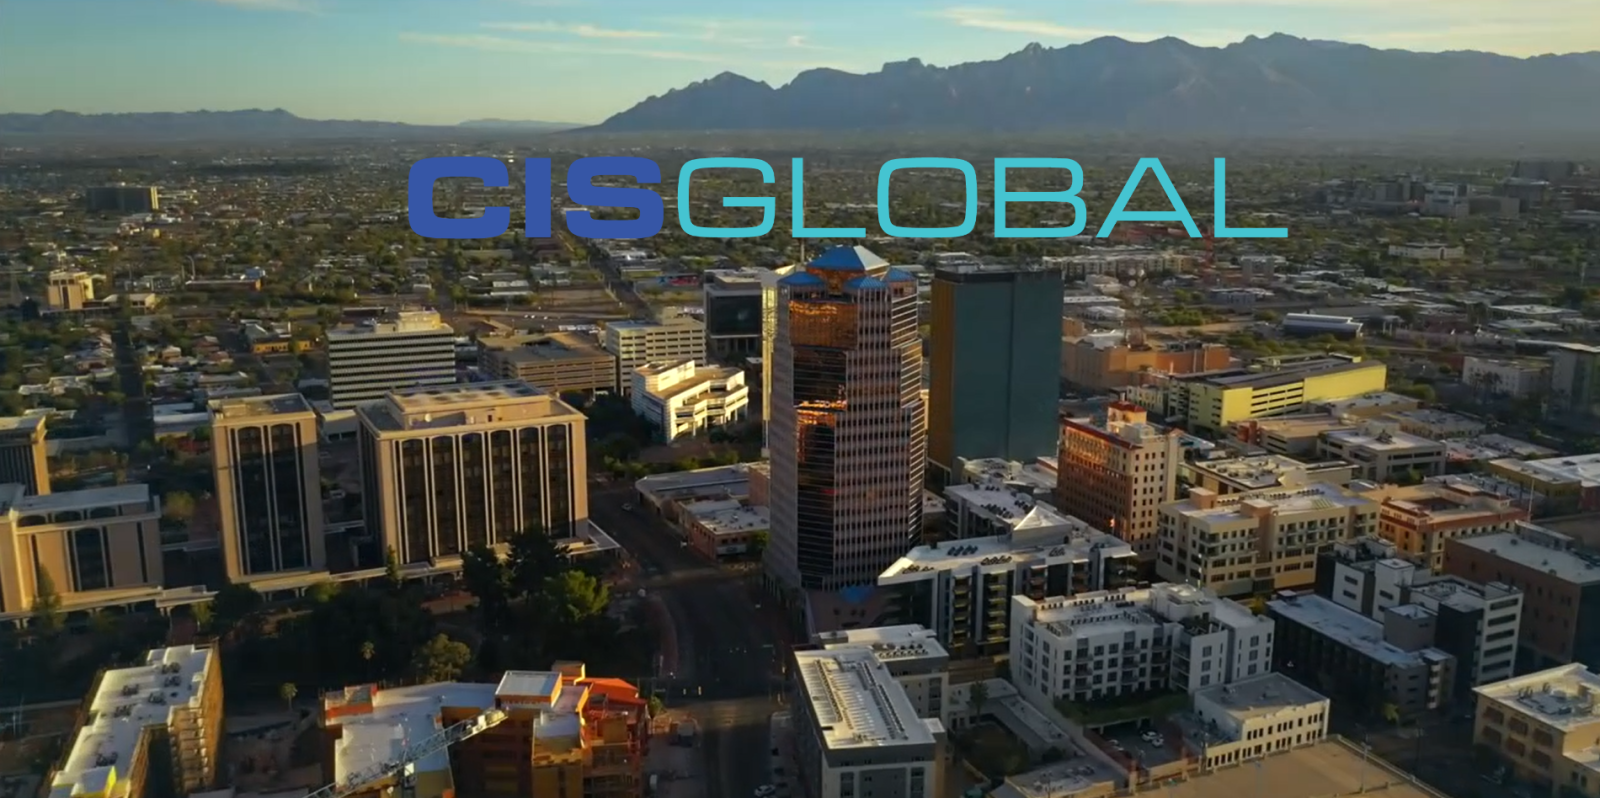 CIS Global Expands Headquarters  in Tucson, Arizona